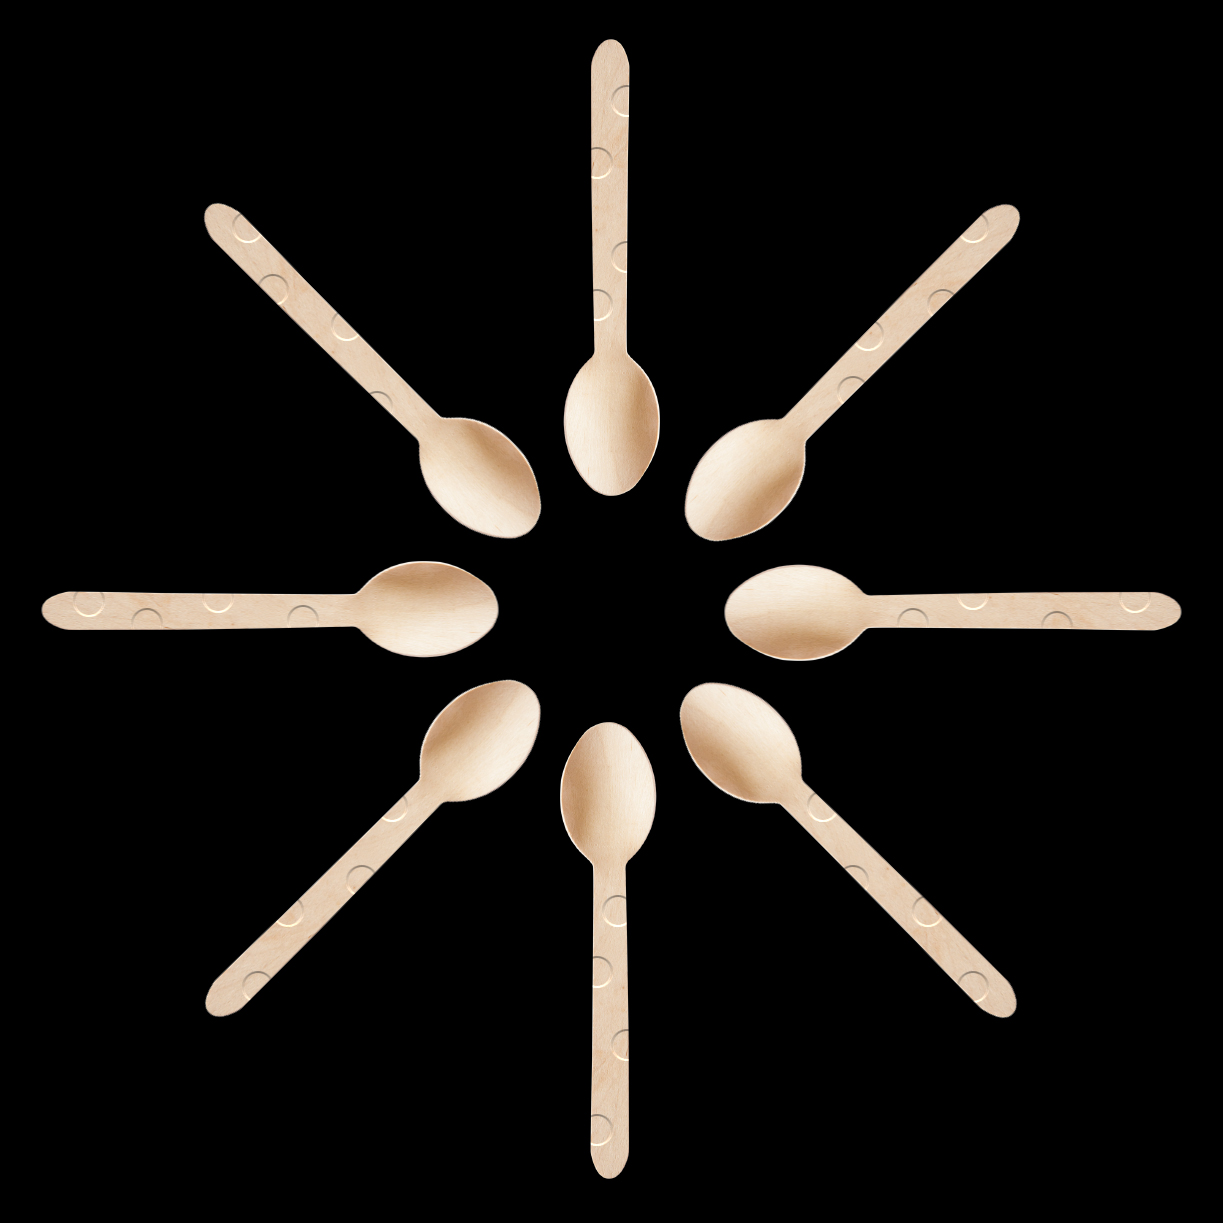 RBS_Four_Seasons_Orlando_Wooden_Spoons